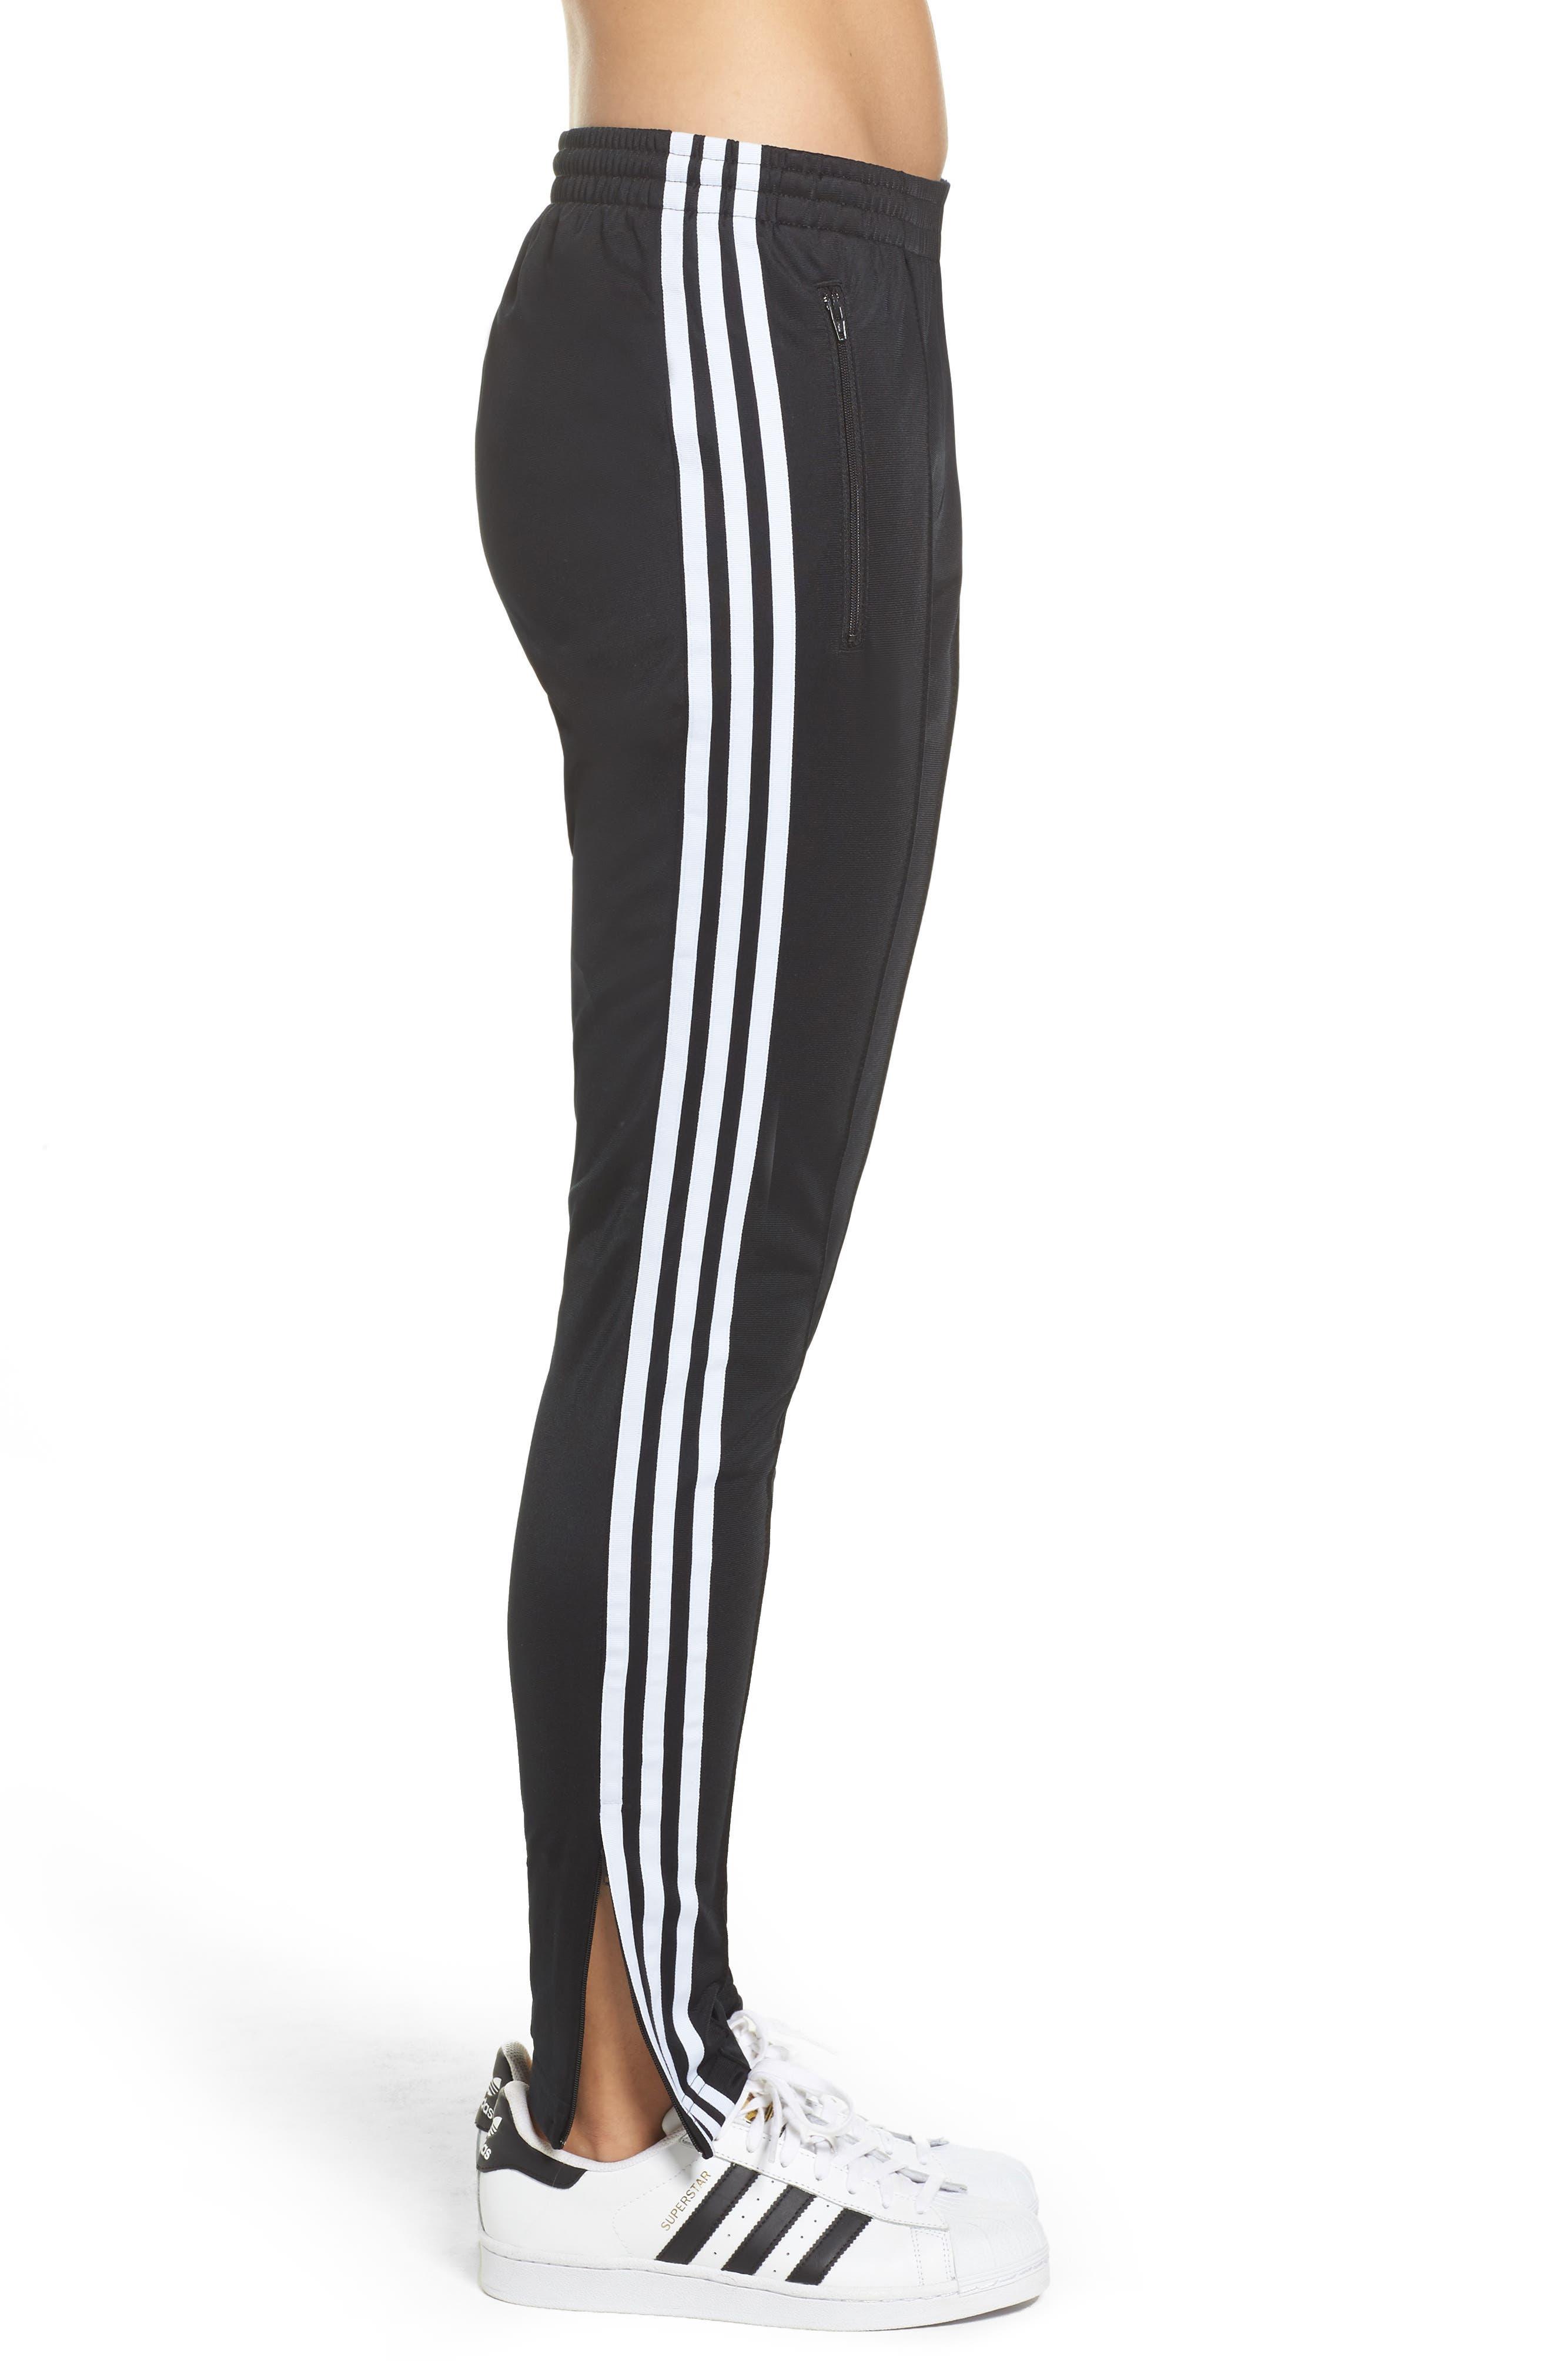 Originals Superstar Track Pants,                             Alternate thumbnail 3, color,                             Black